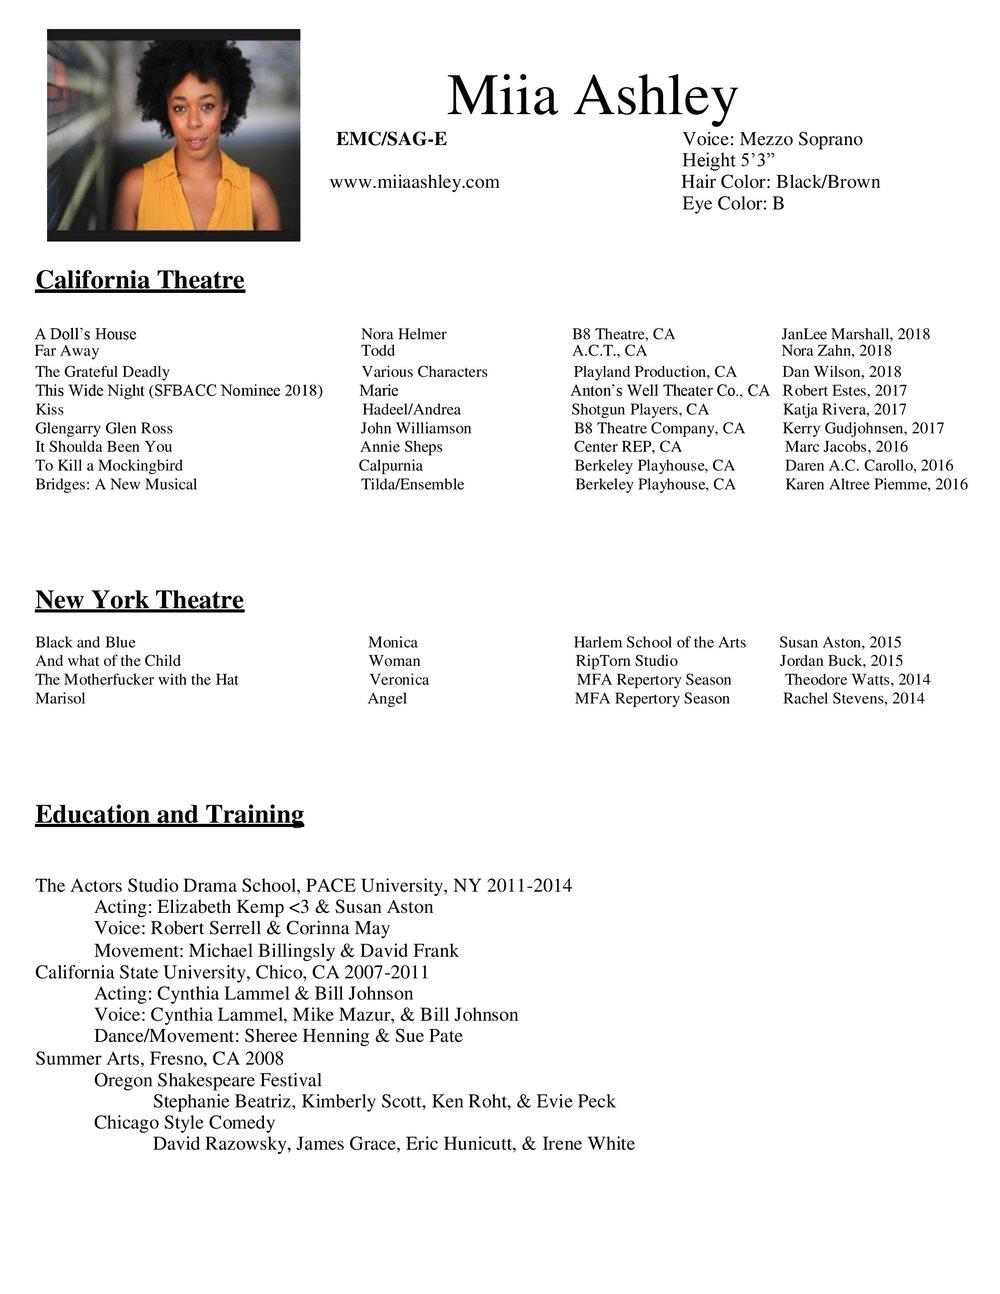 Miia Ashley - THEATRICAL RESUME-page-001.jpg